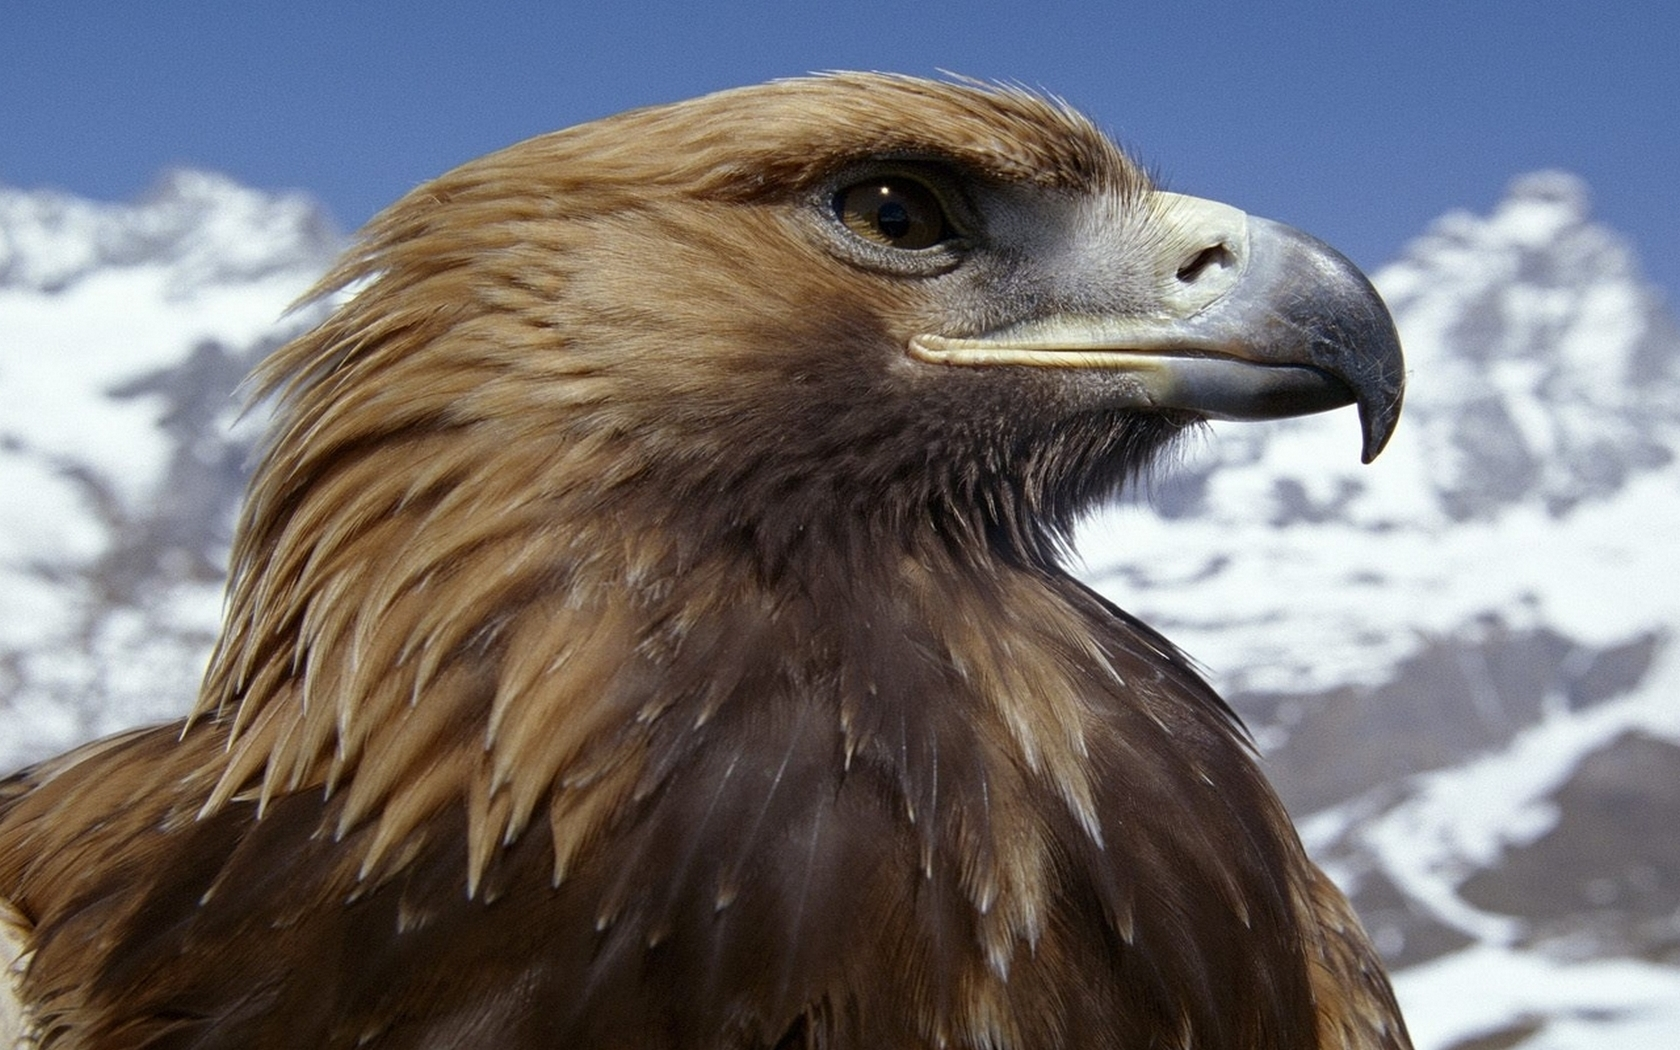 Aguila marron - 1680x1050